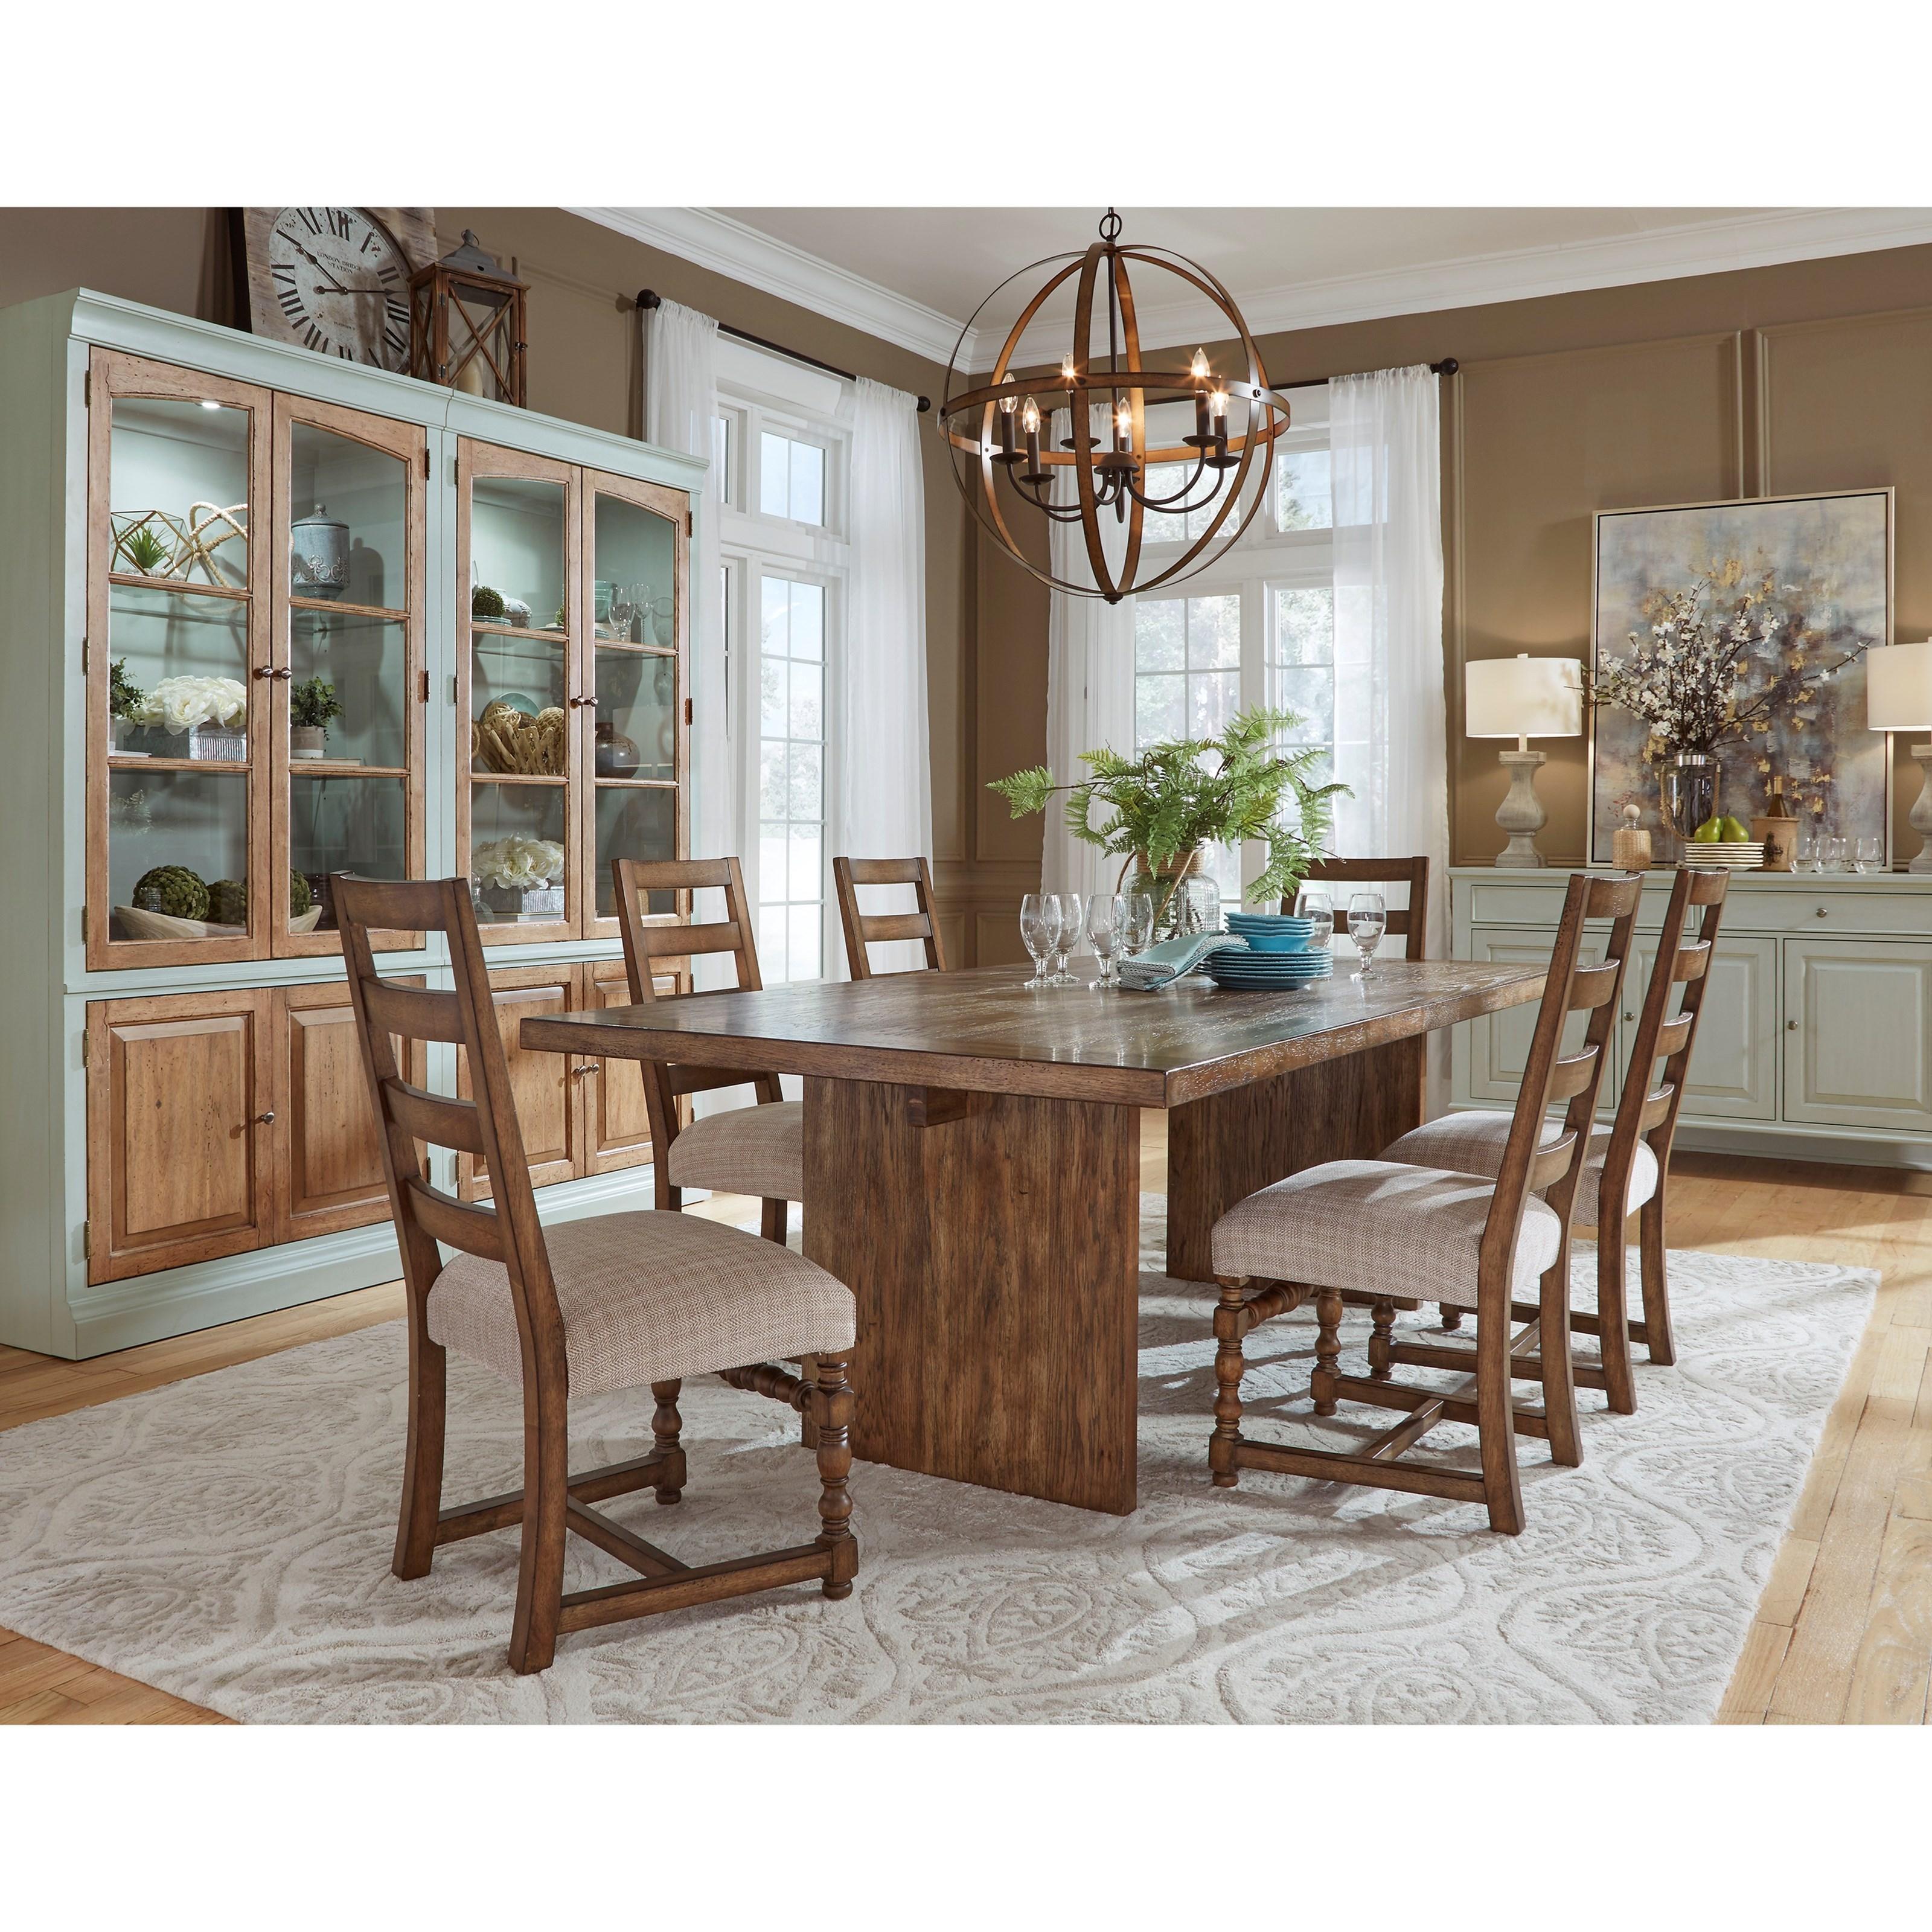 Pulaski Furniture Store: Pulaski Furniture The Art Of Dining Formal Dining Room